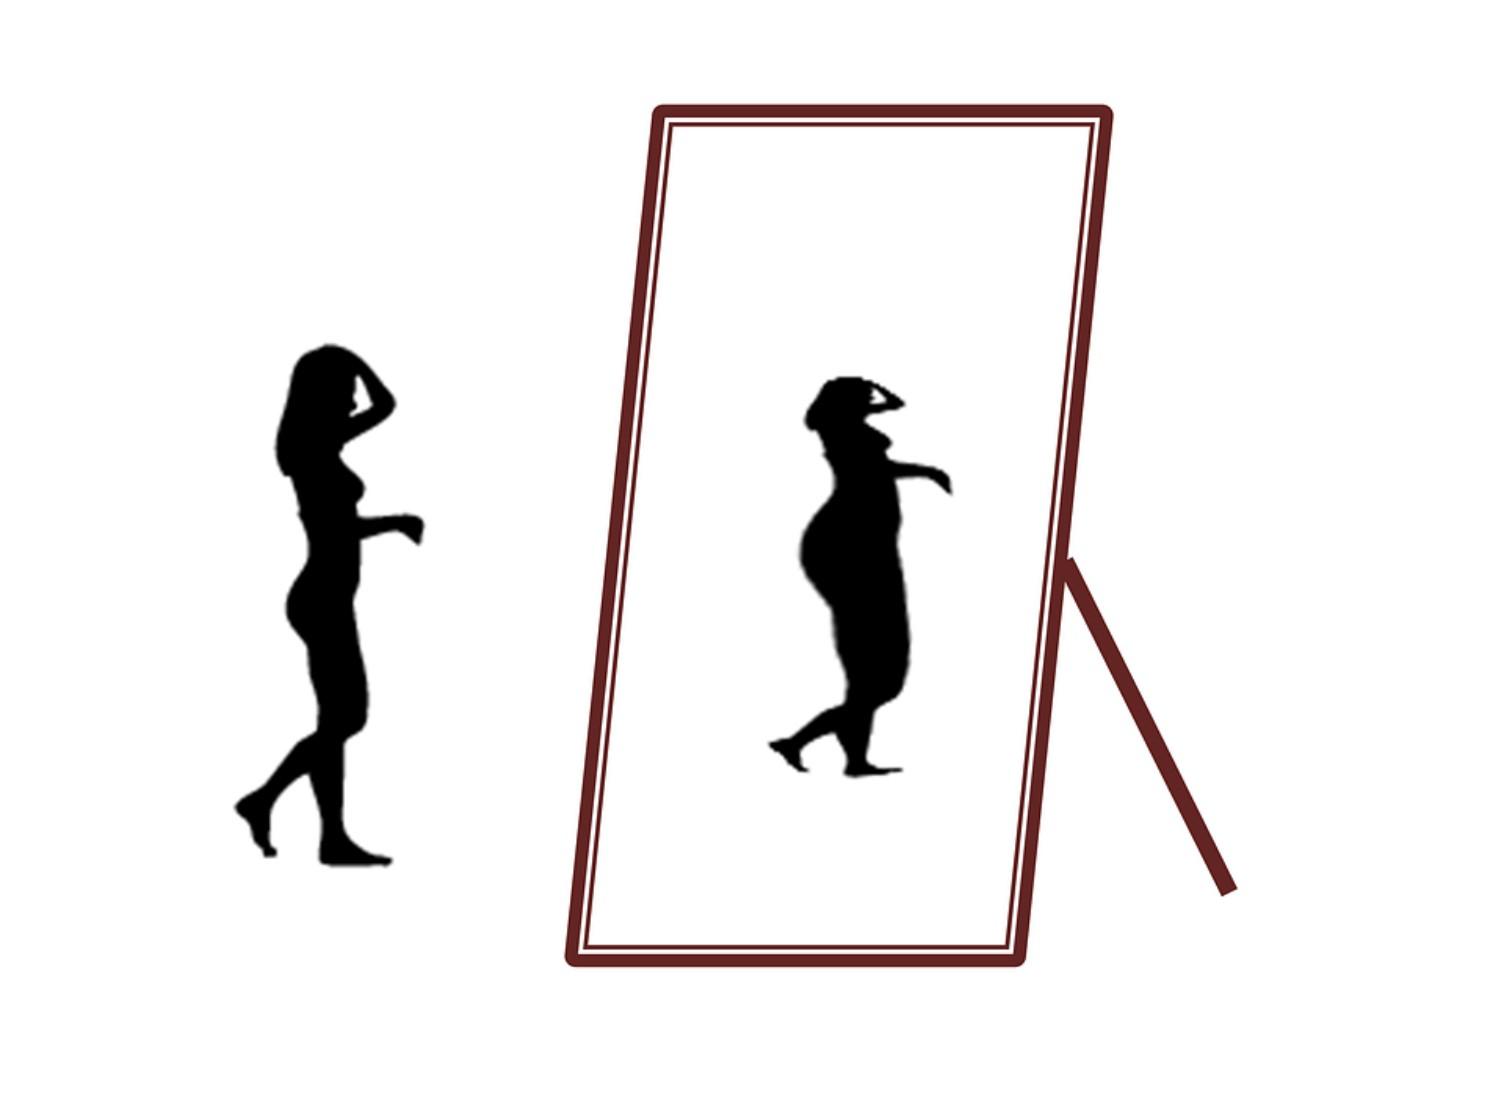 Anoreksija – izguba apetita